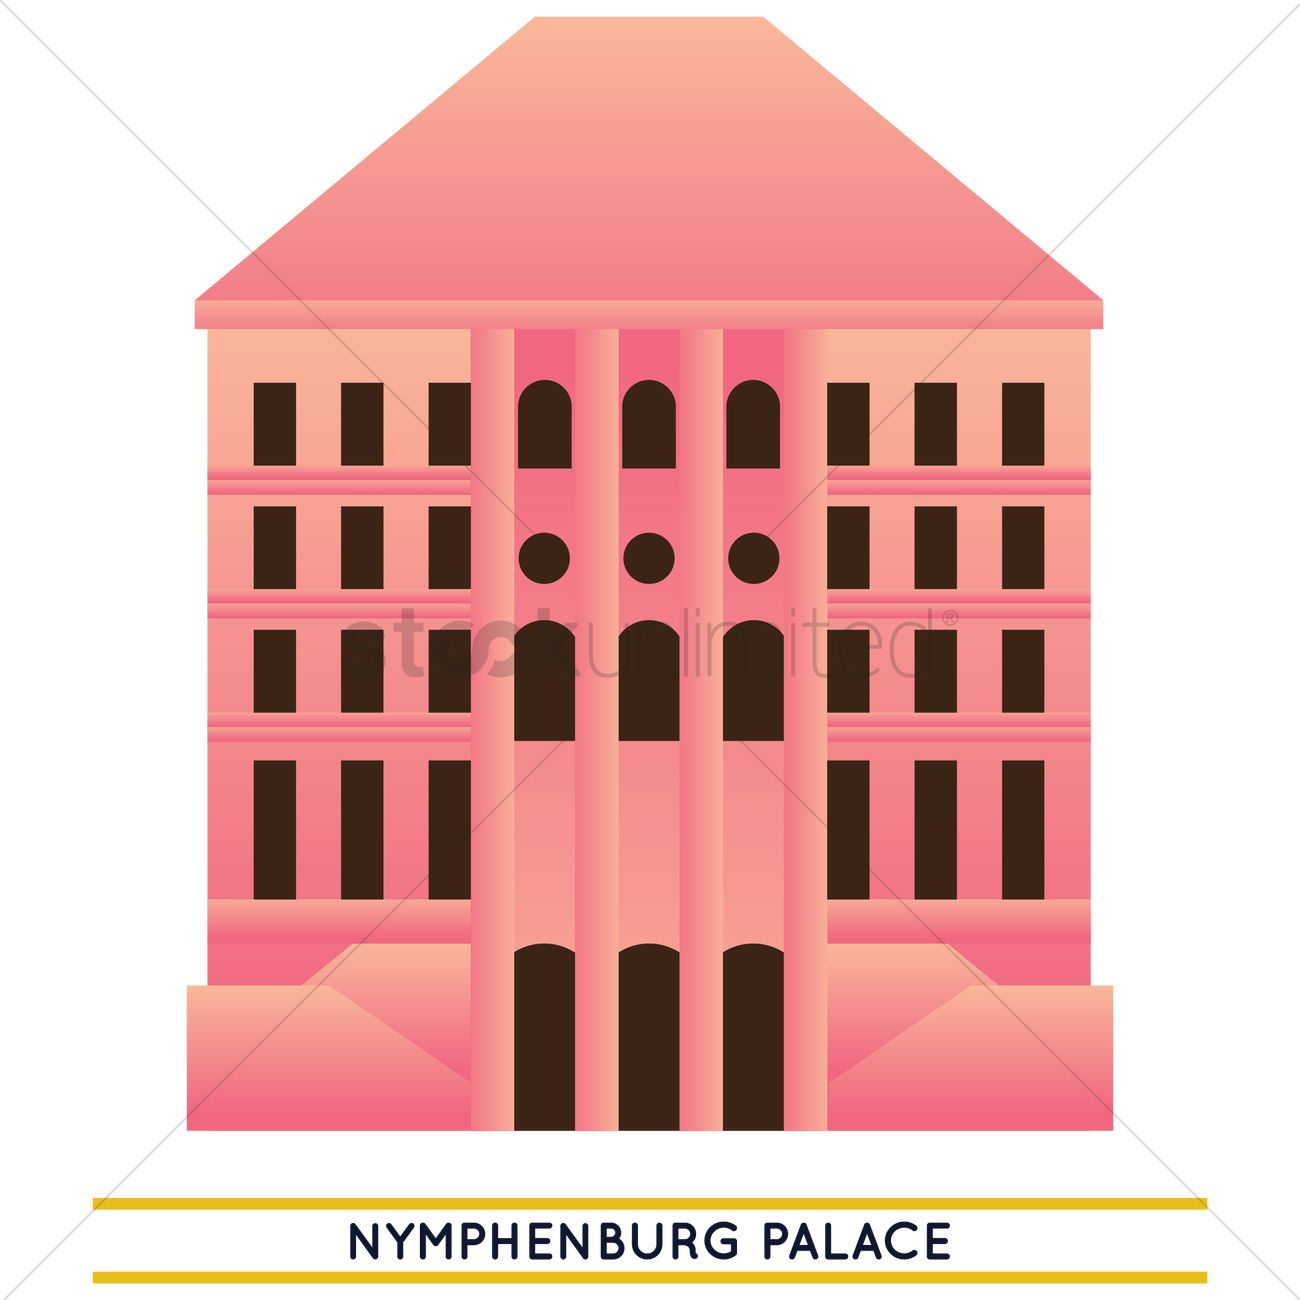 Nymphenburg palace Vector Image.